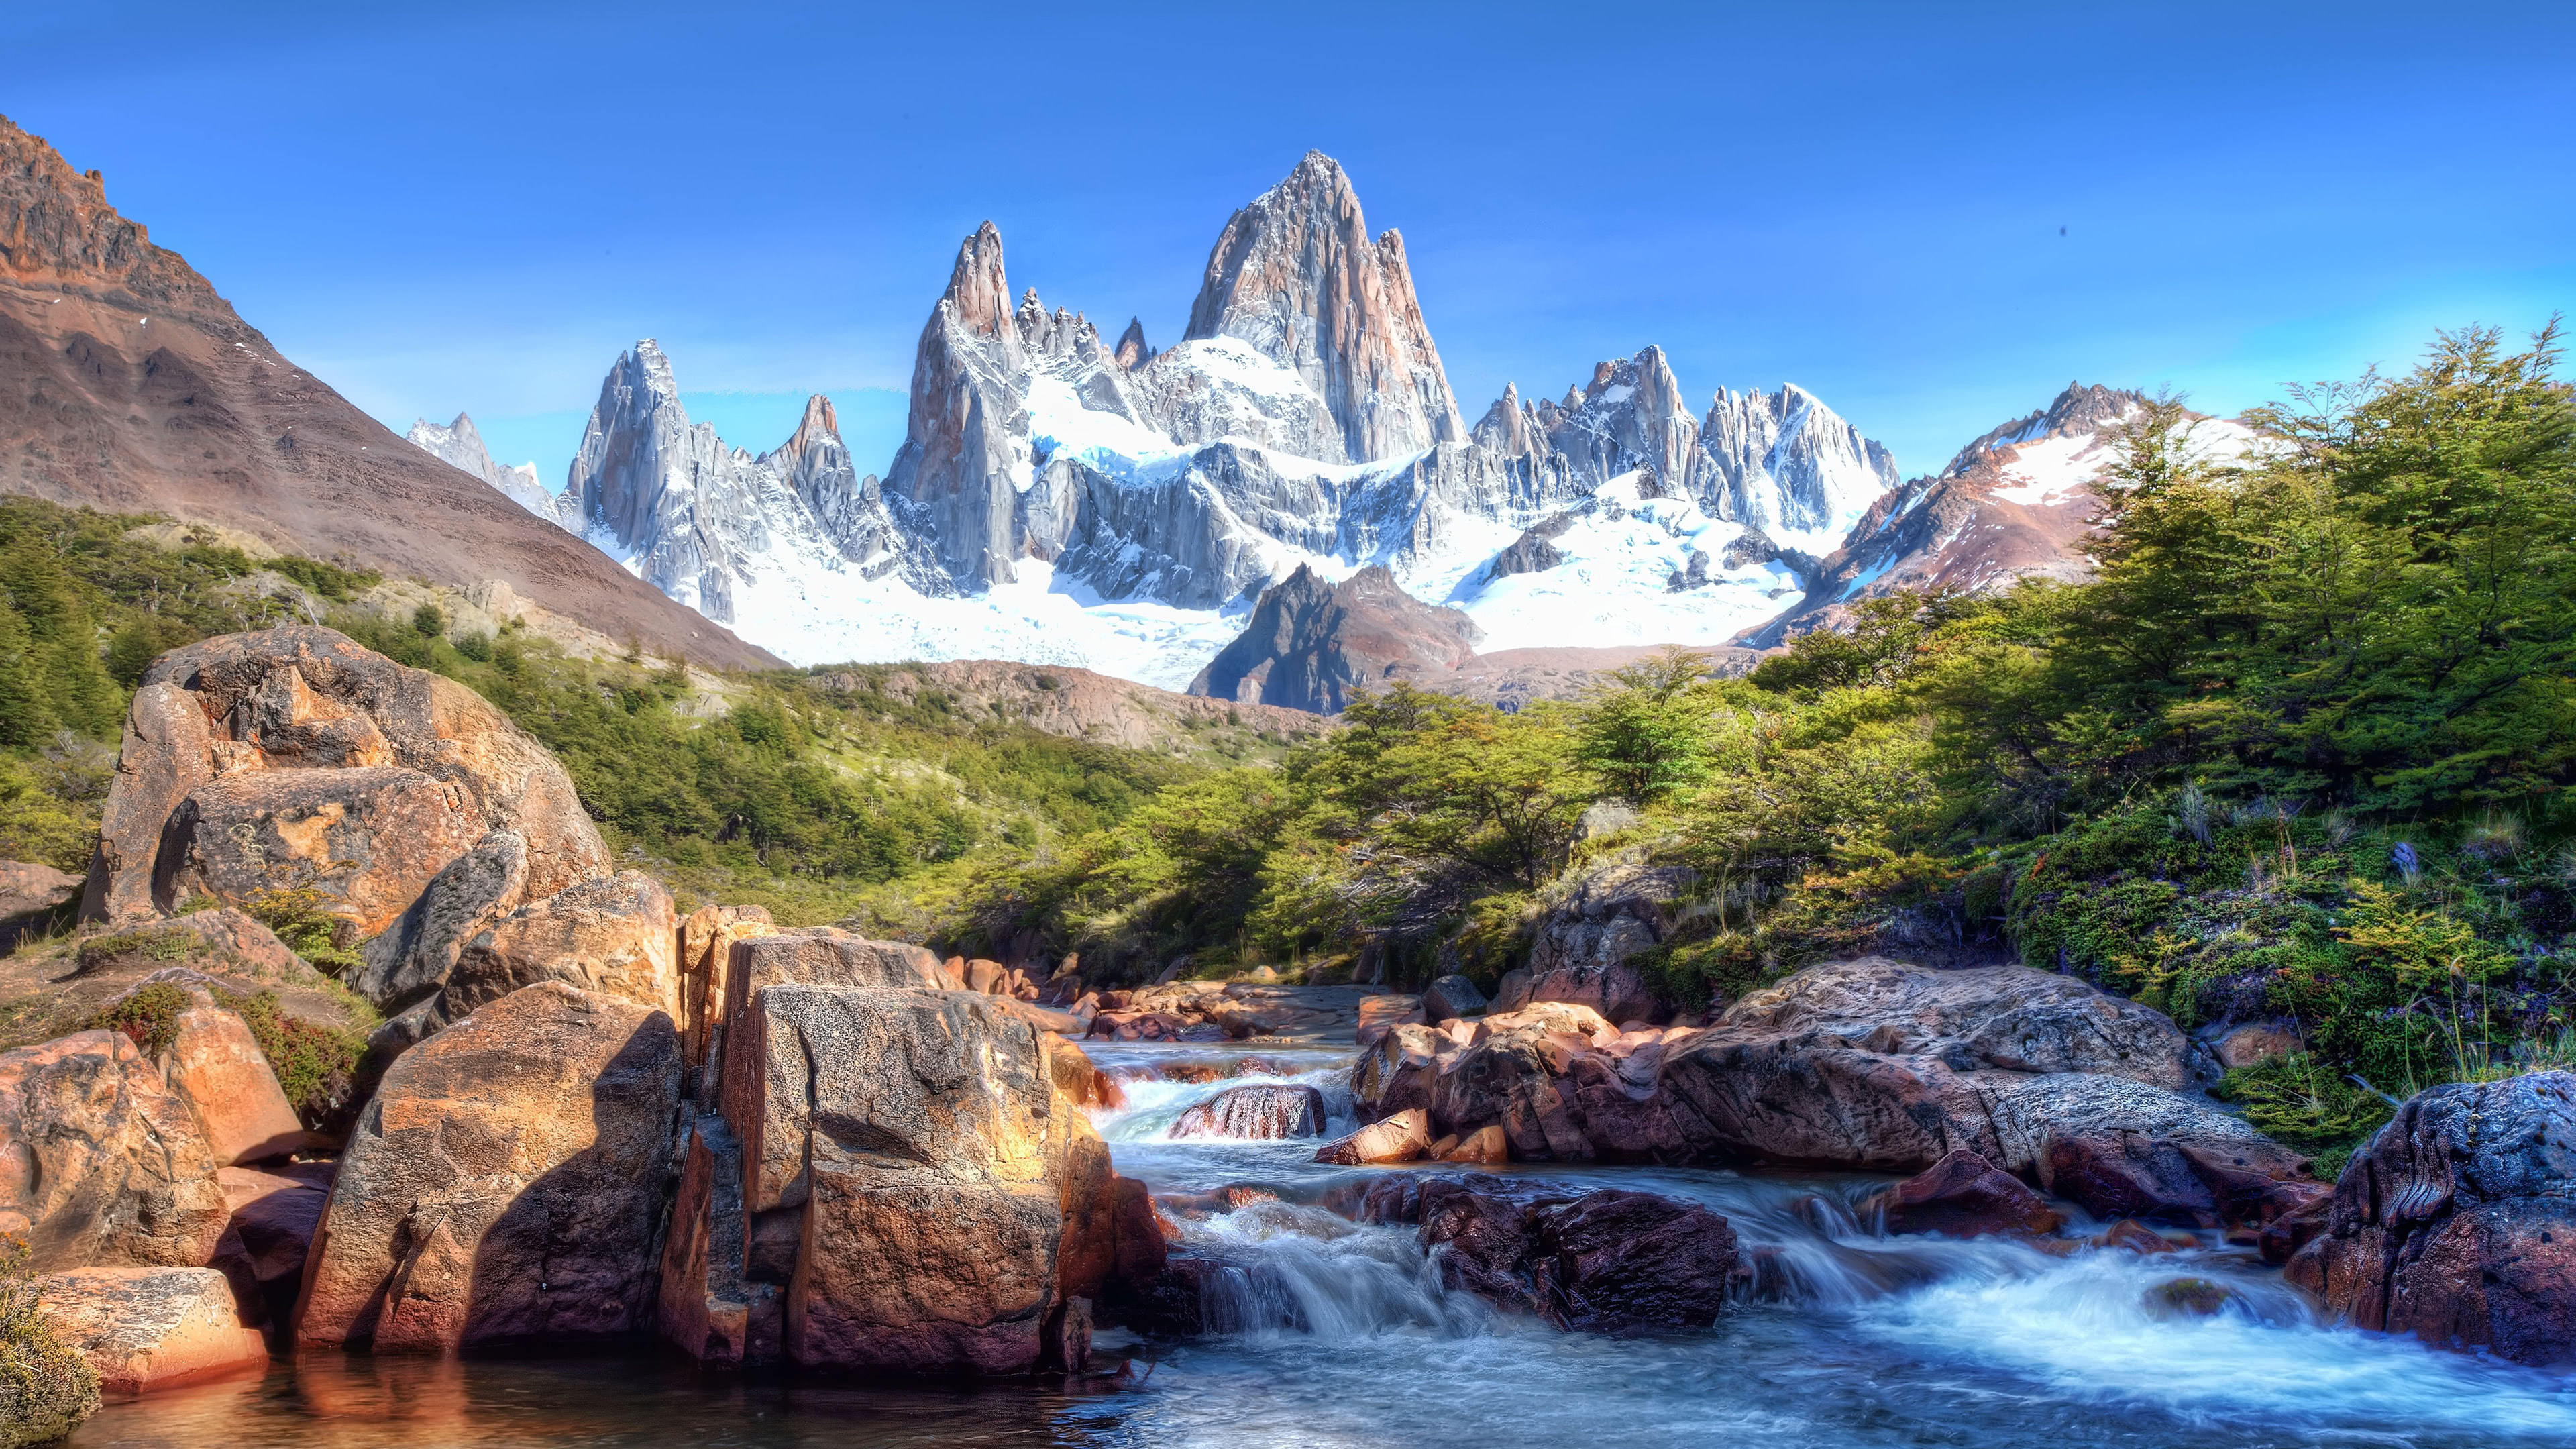 Monte Fitz Roy Patagonia Uhd 4k Wallpaper Pixelz